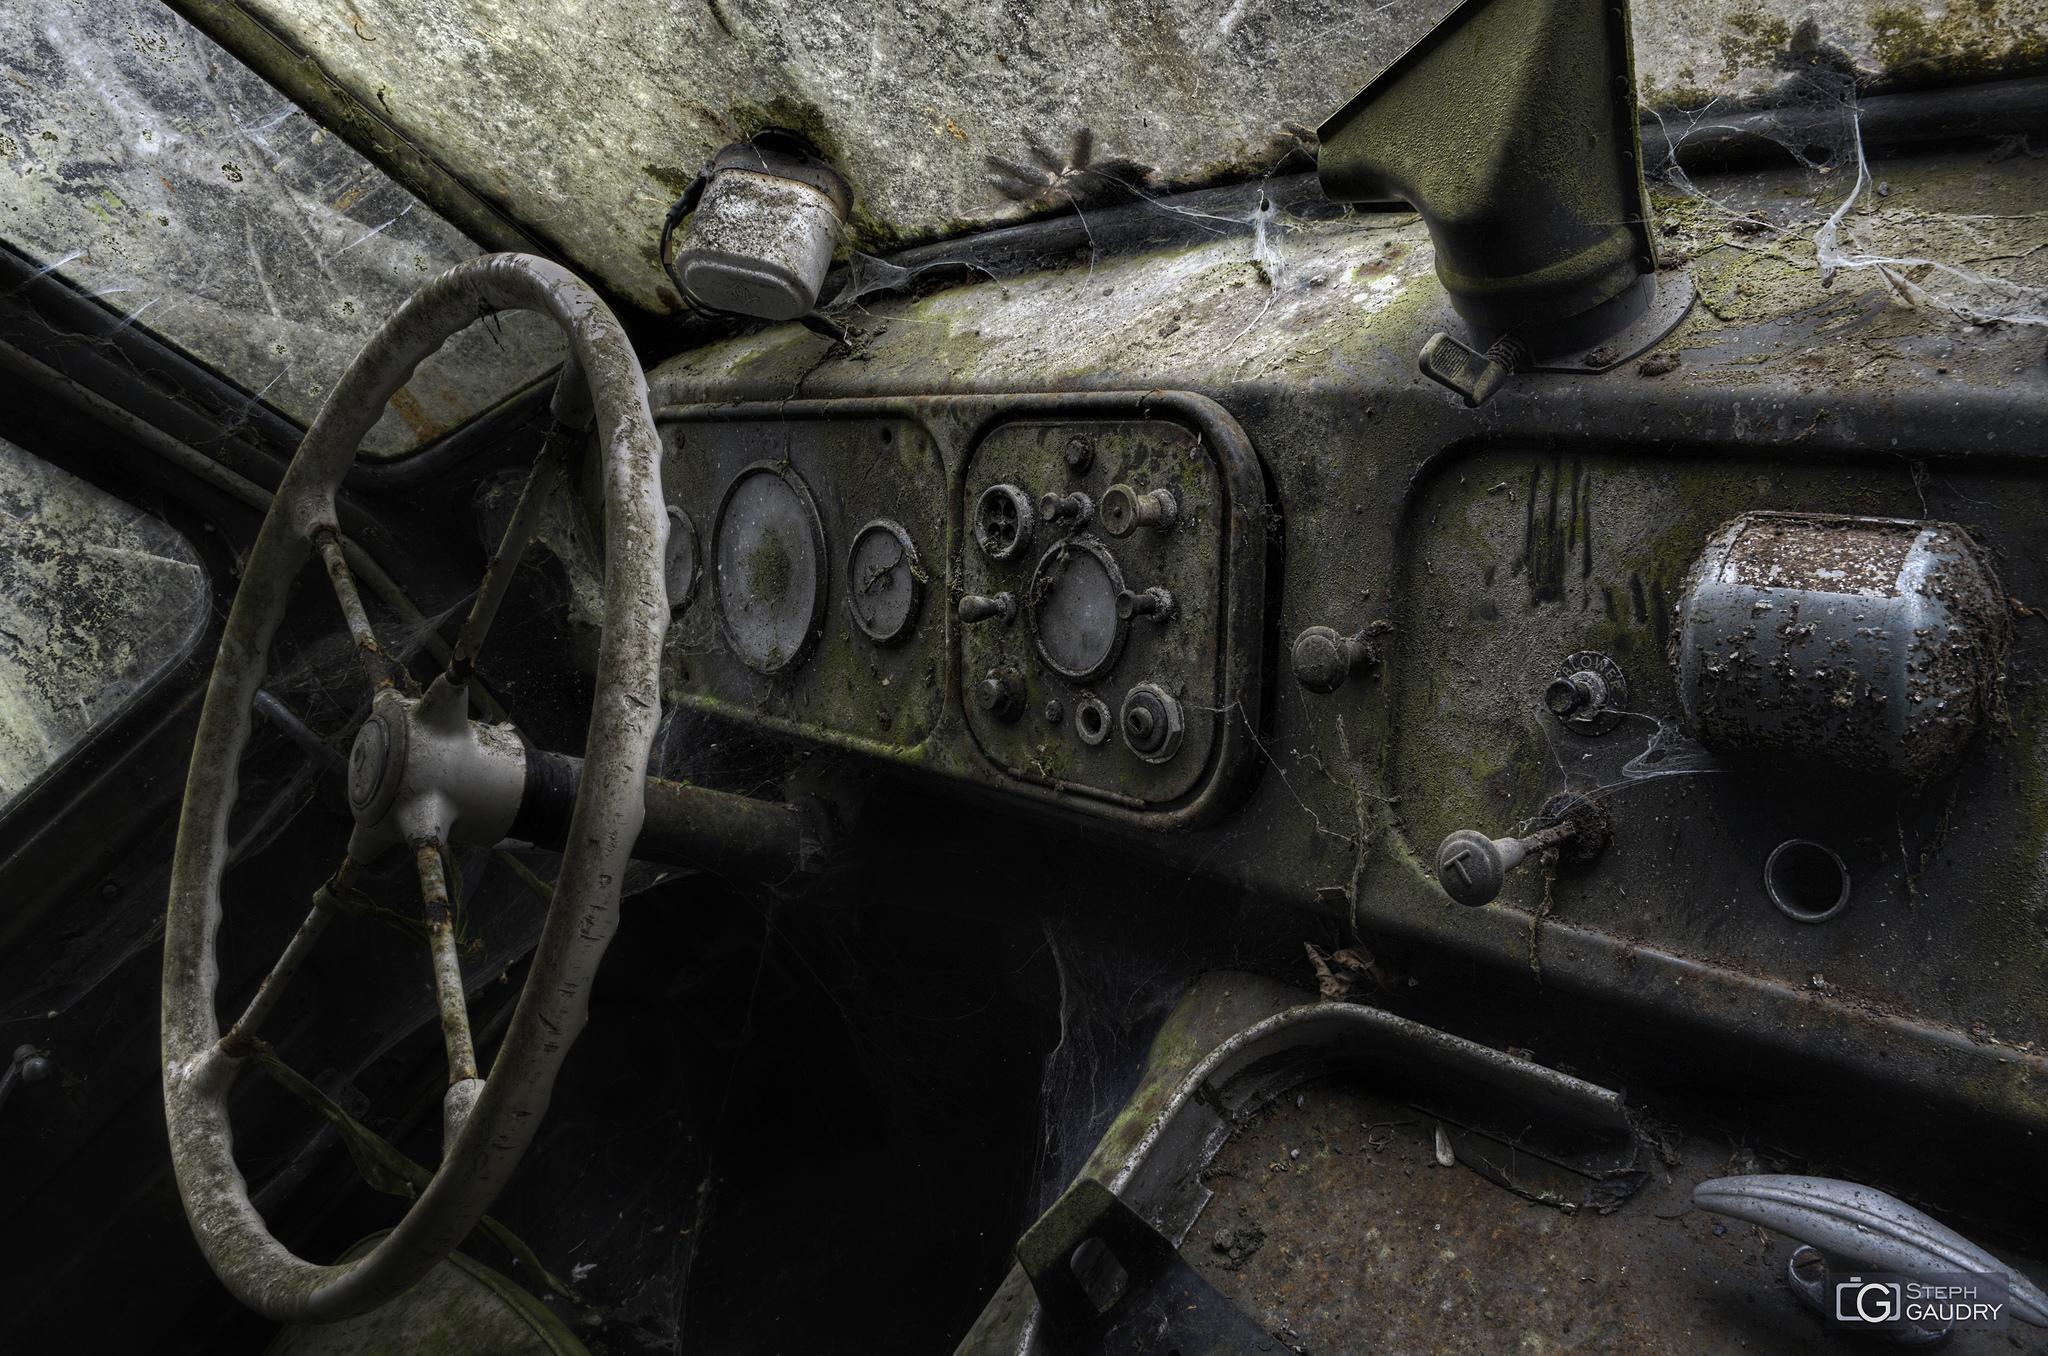 The ghost truck [Klik om de diavoorstelling te starten]